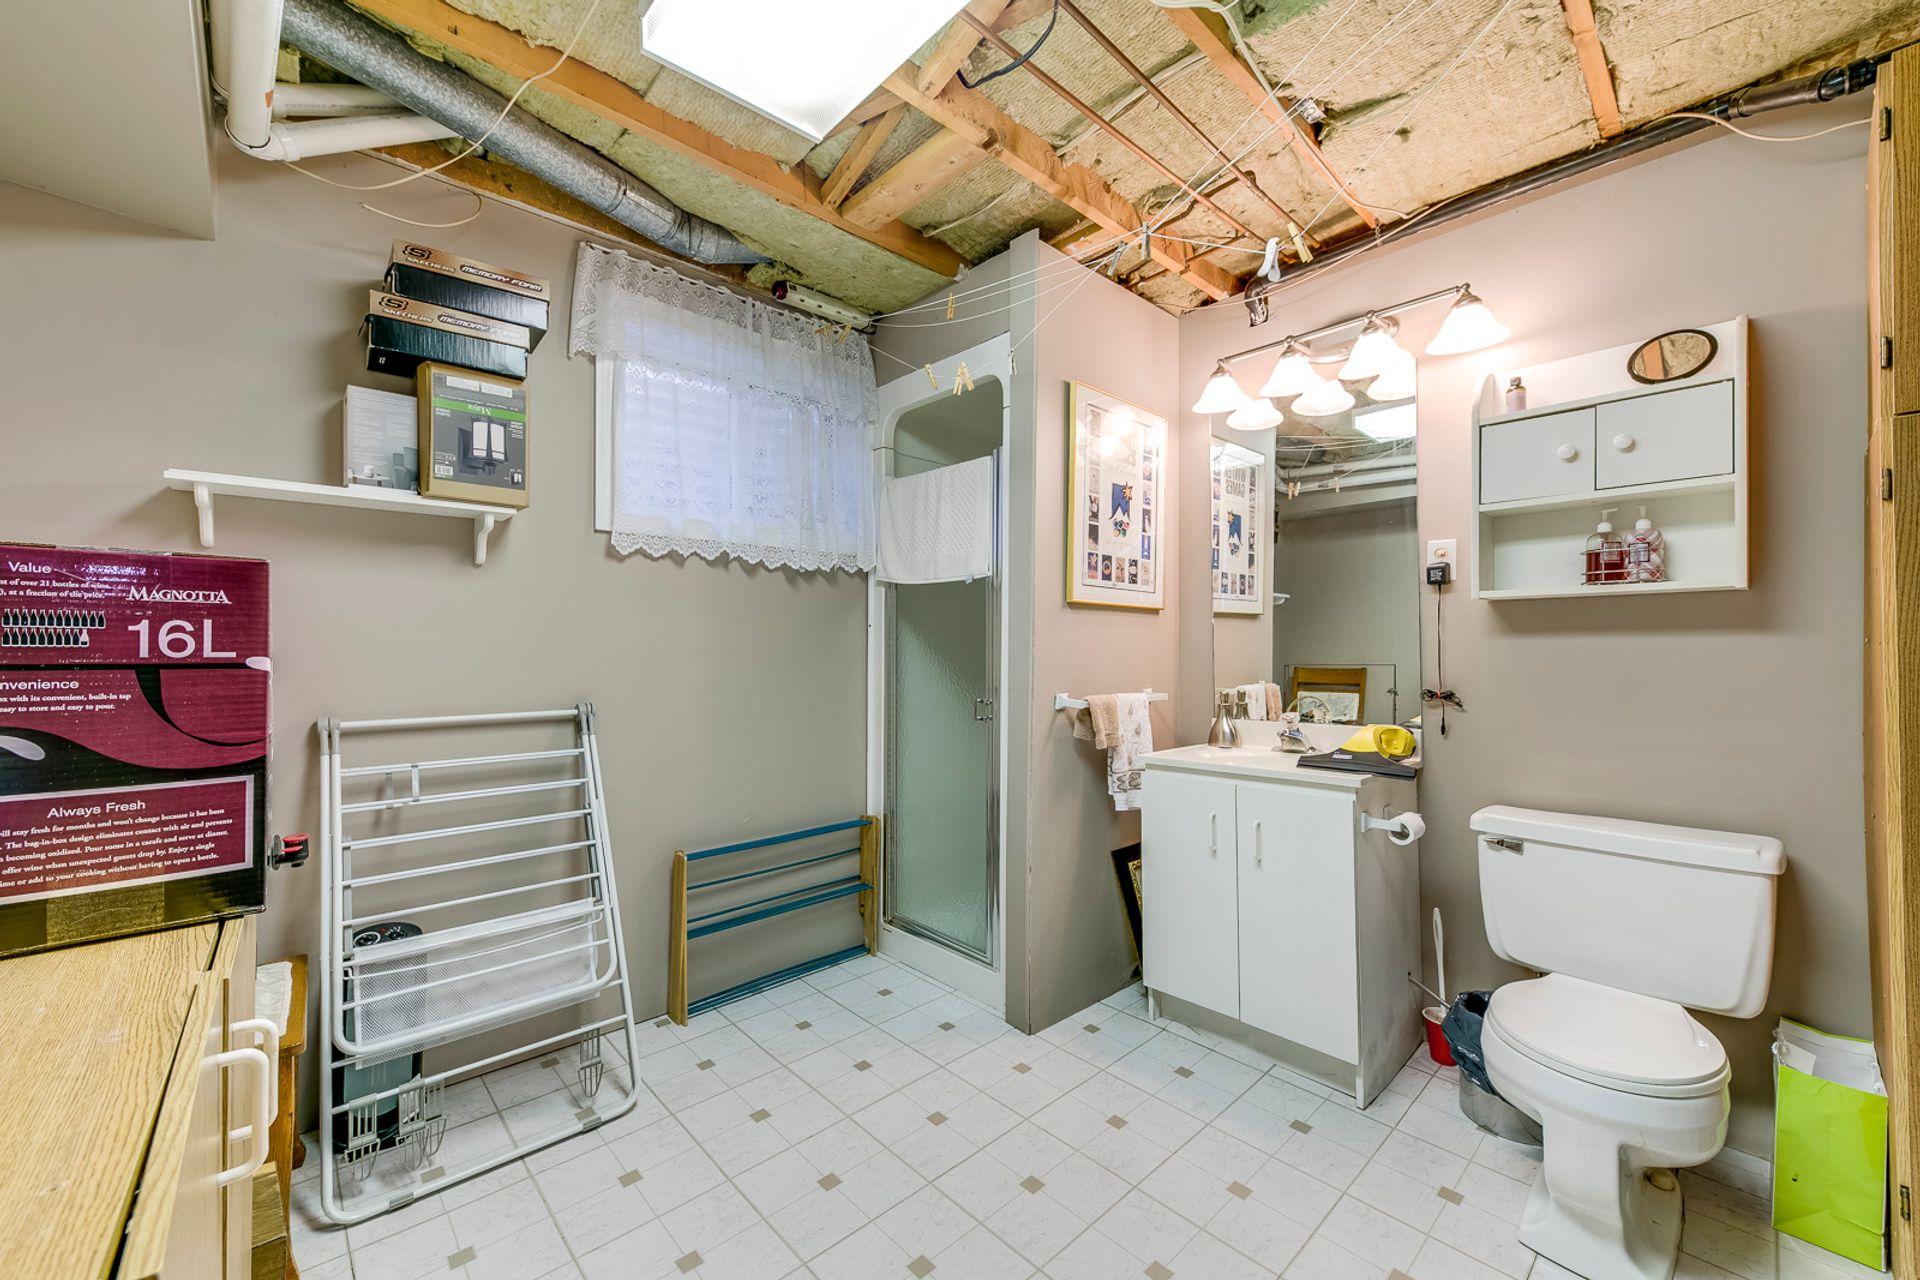 Basement Bathroom - 1246 Landfair Cres, Oakville - Elite3 & Team at 1246 Landfair Crescent, Iroquois Ridge South, Oakville